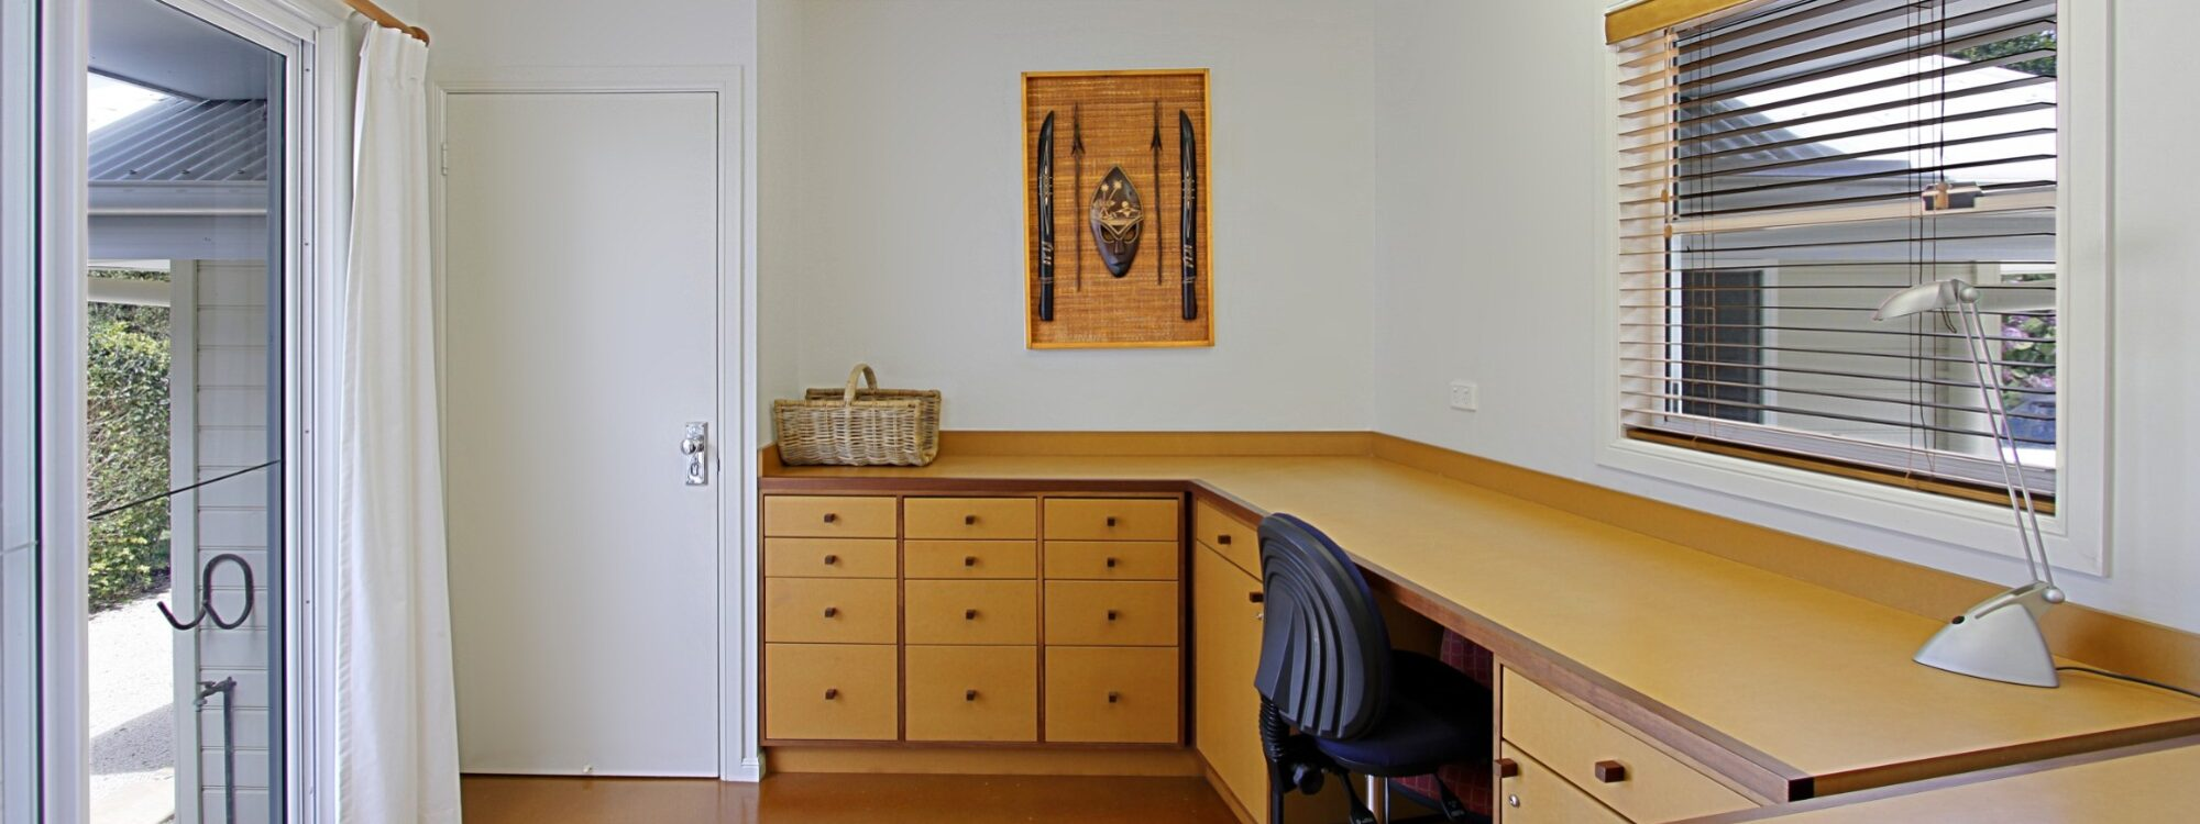 Abode at Byron - Interior Details